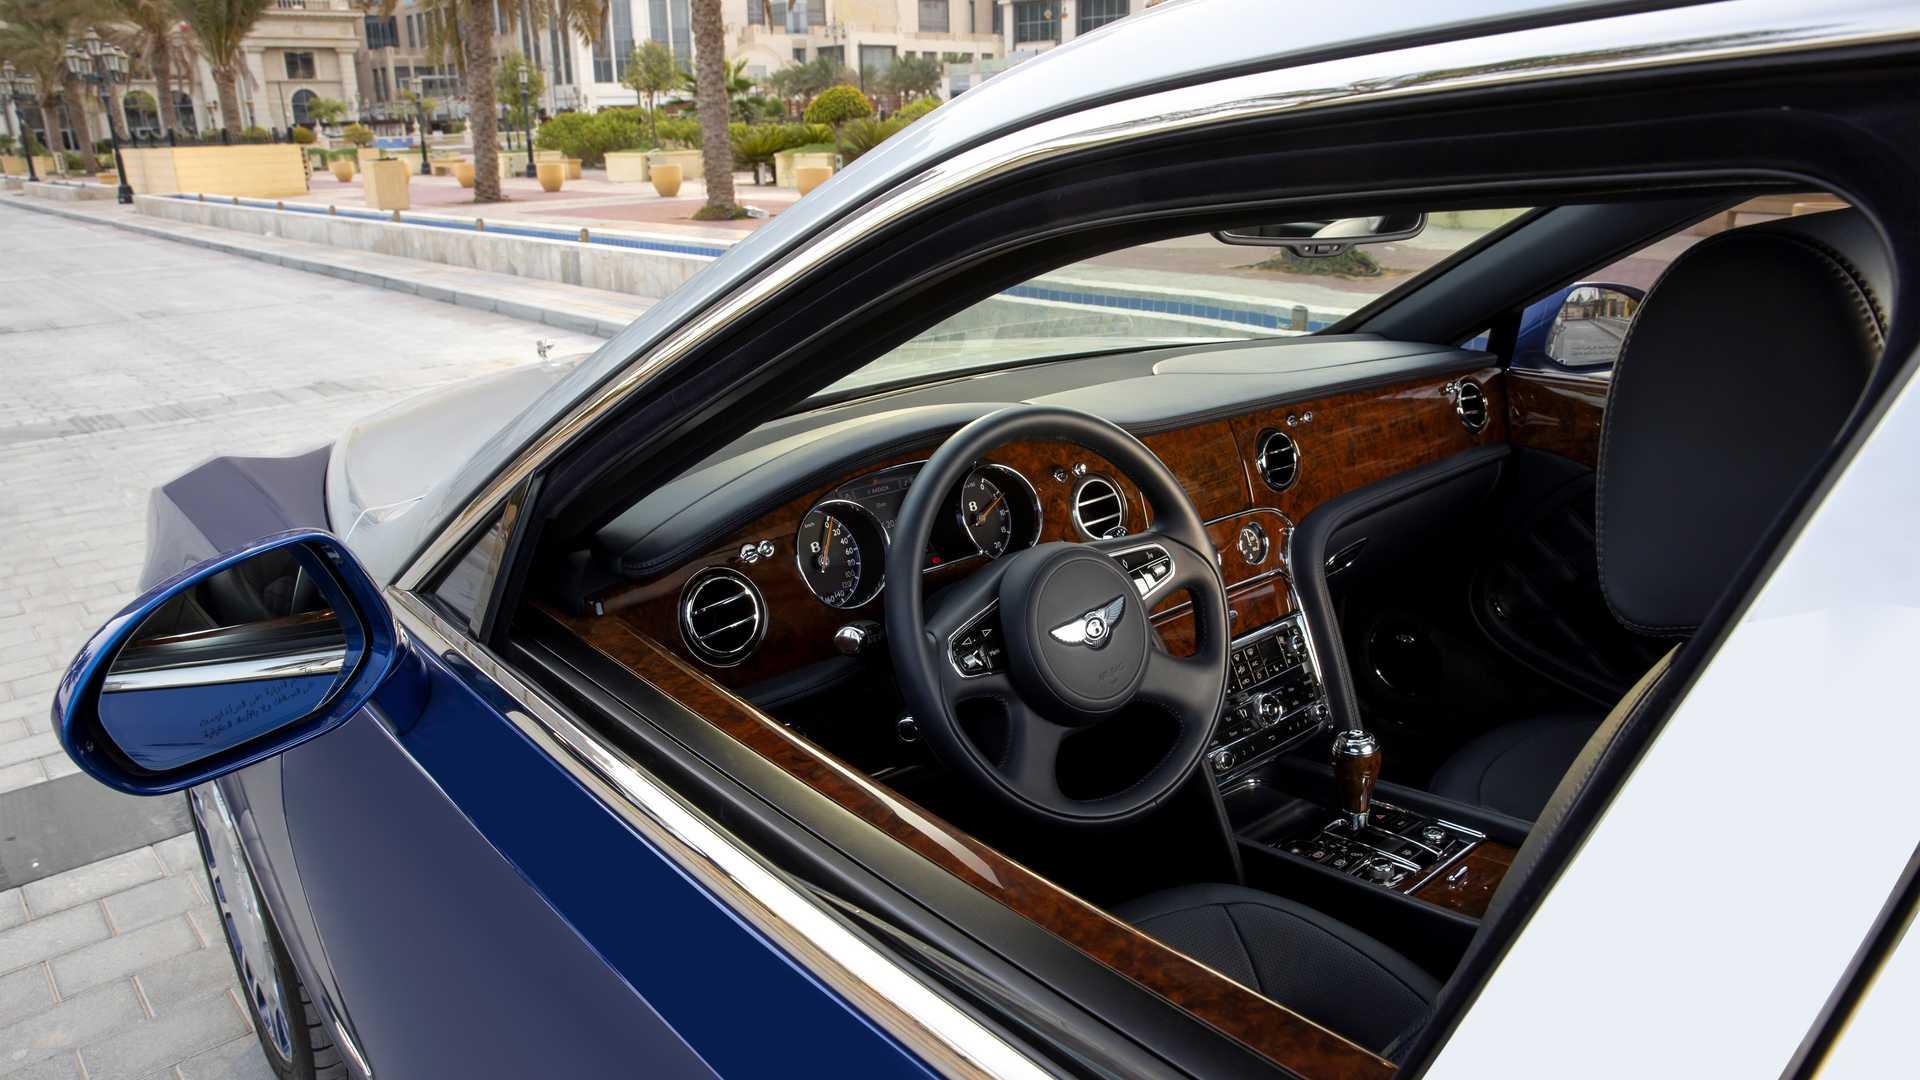 Bentley-Mulsanne-Grand-Limousine-by-Mulliner-6